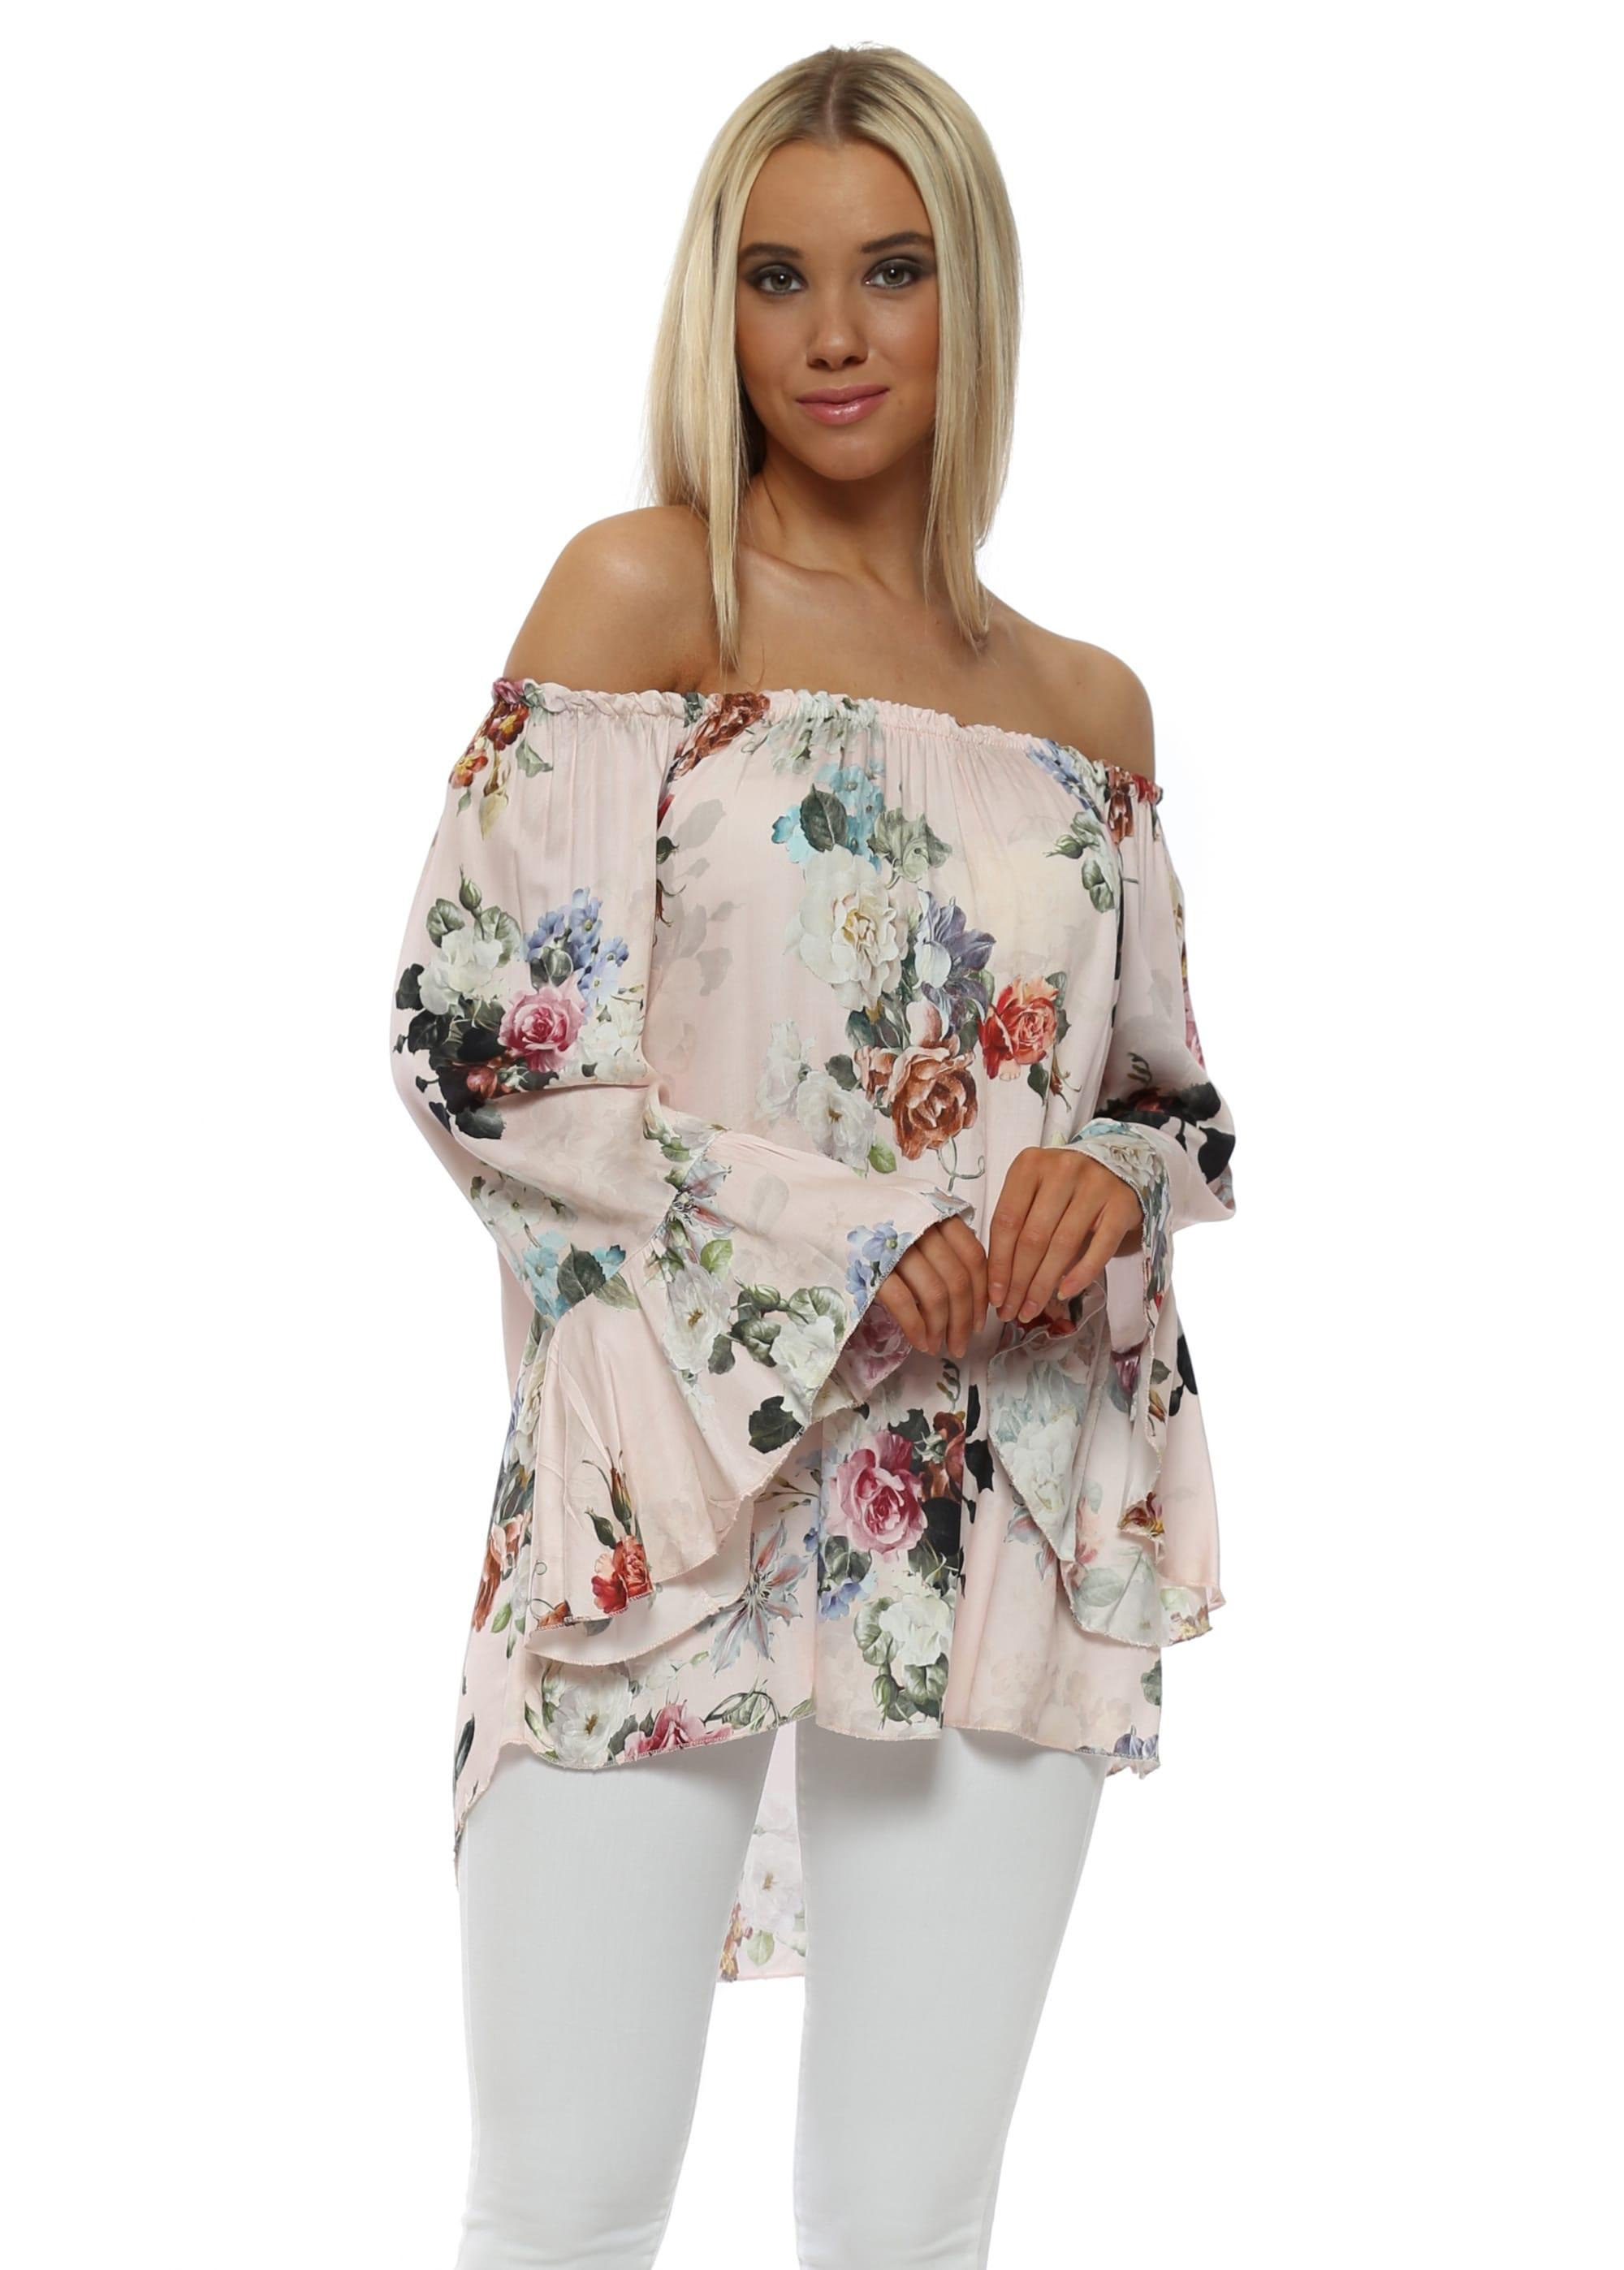 08e4371a73151 Blush Pink Floral Frill Cuff Bardot Top